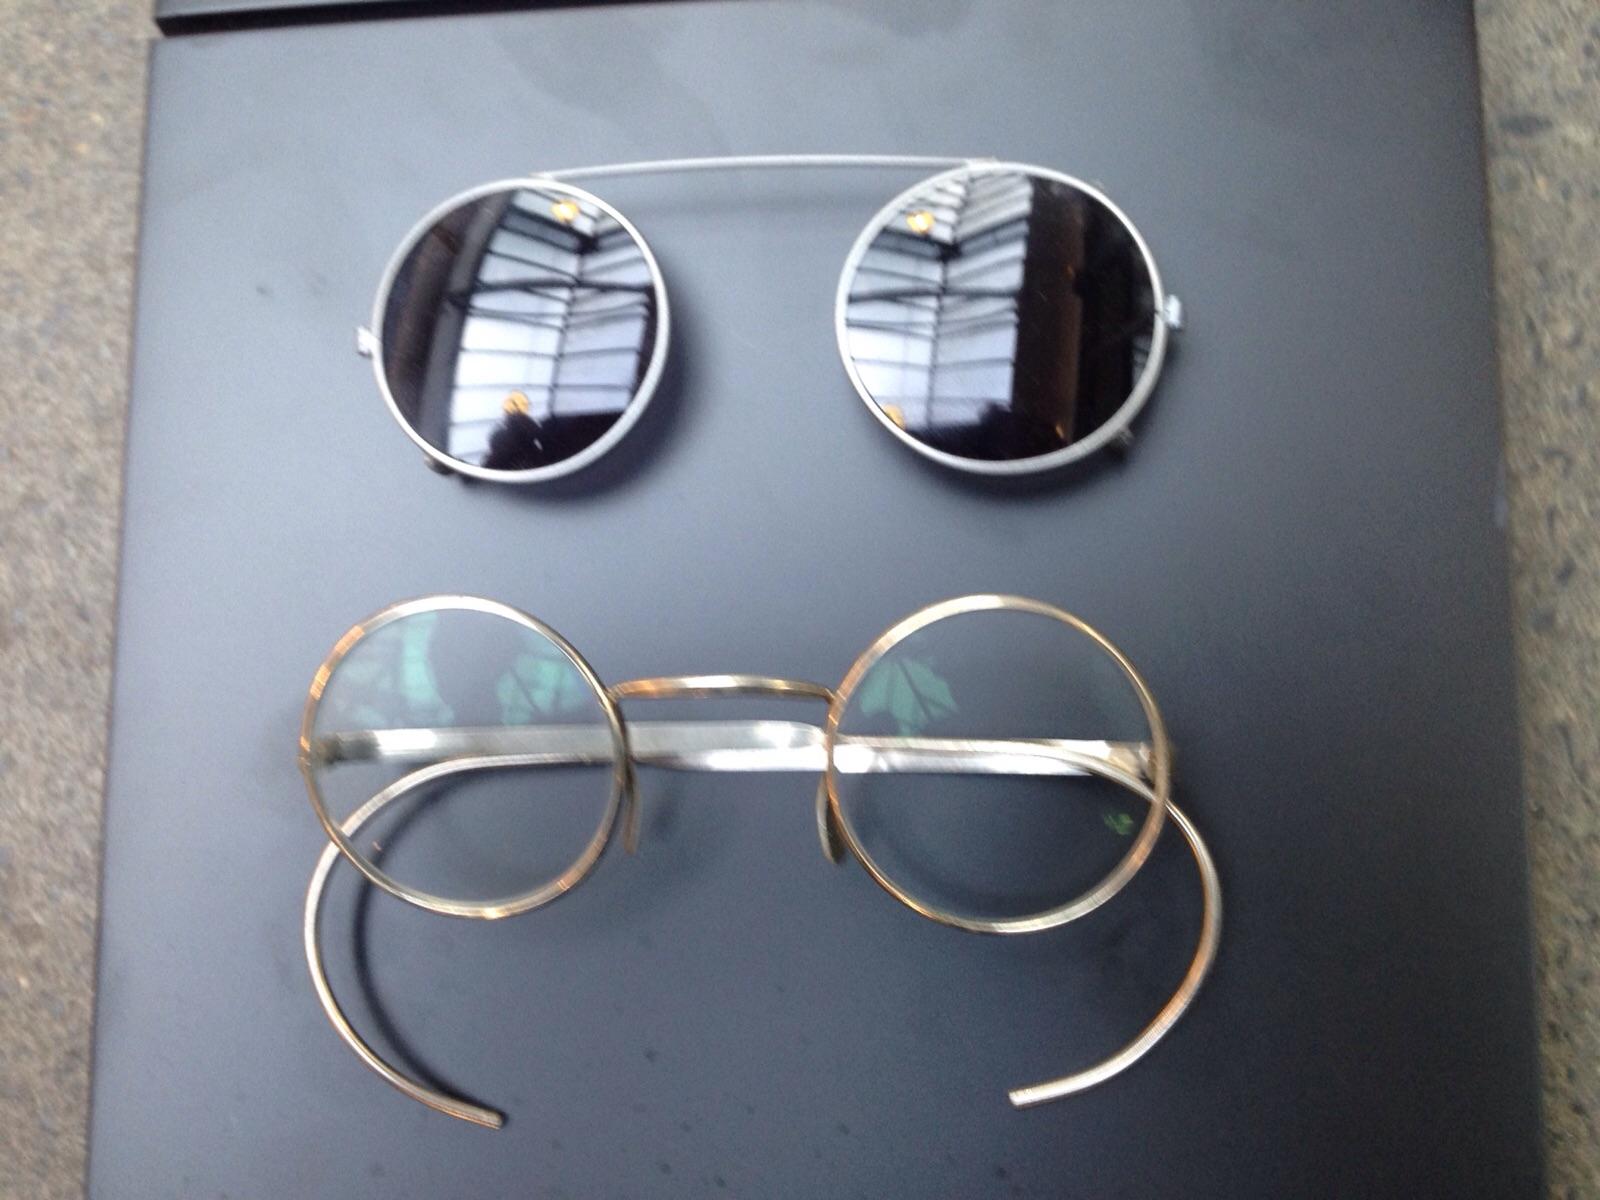 Clip on sunglasses | Eye Contact Opticians, Liverpool Street, London